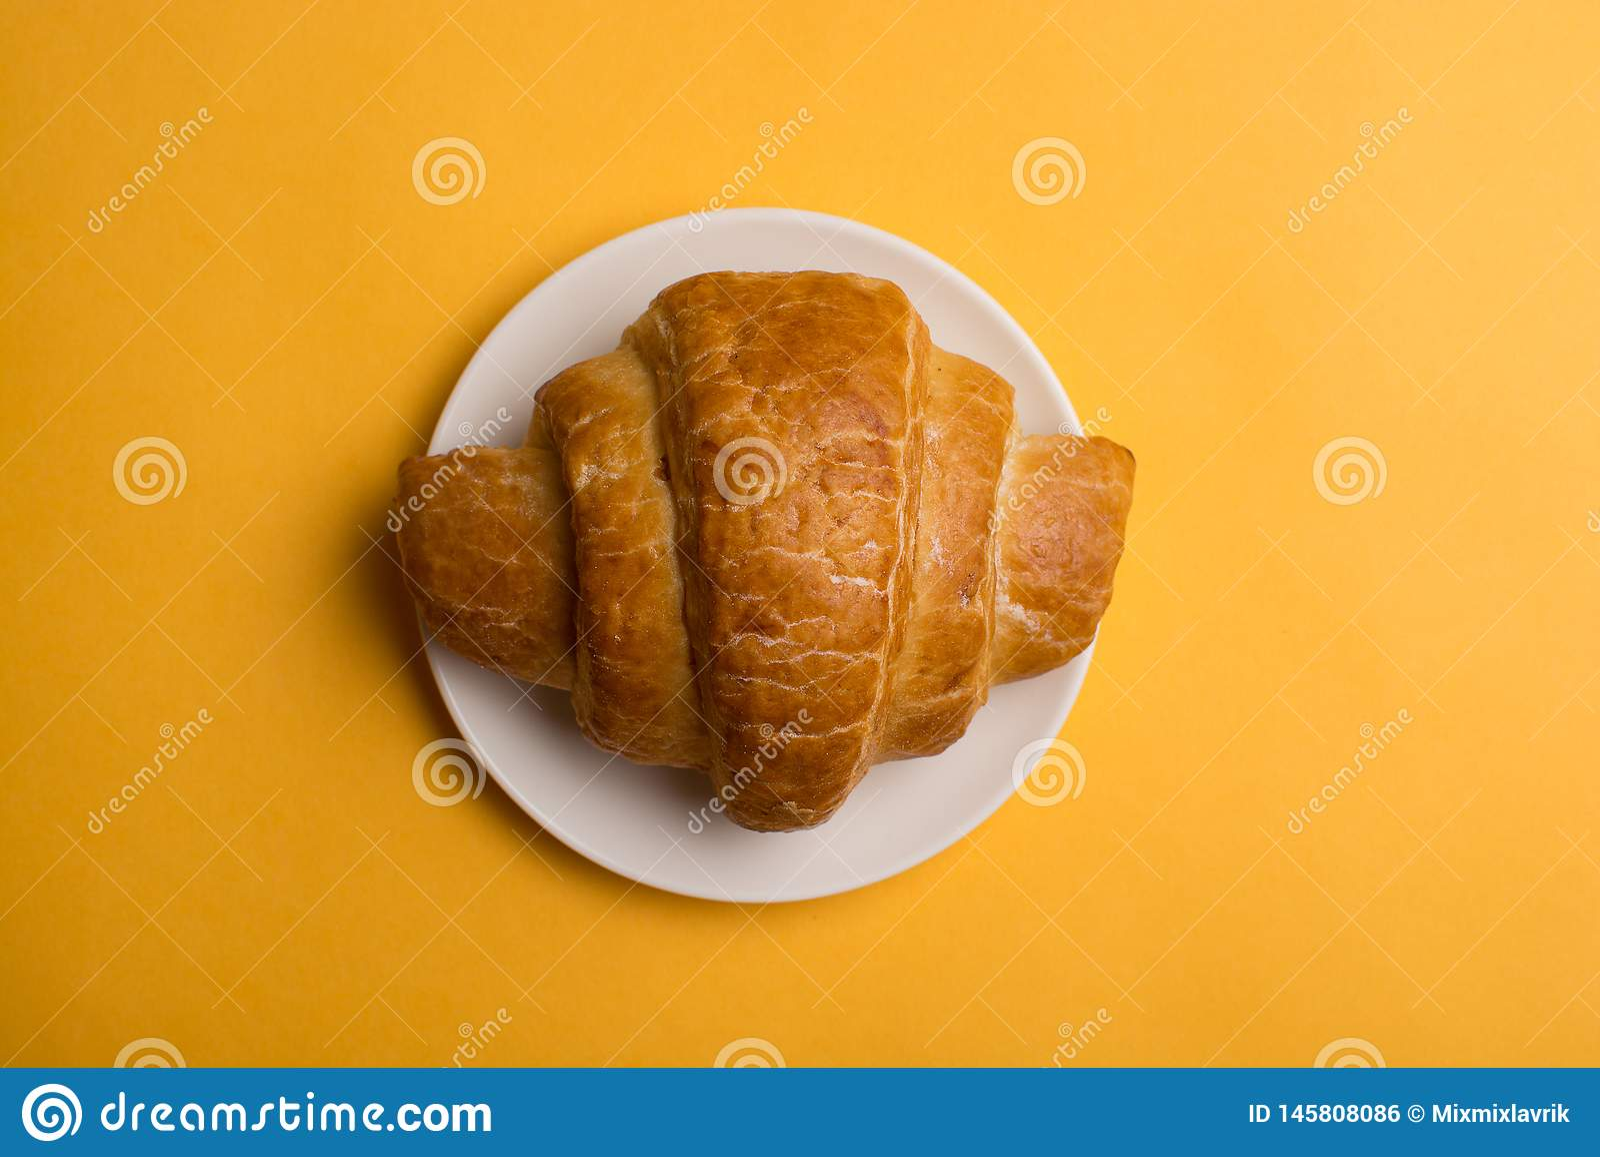 Croissants σε ένα άσπρο πιάτο σε ένα κίτρινο υπόβαθρο